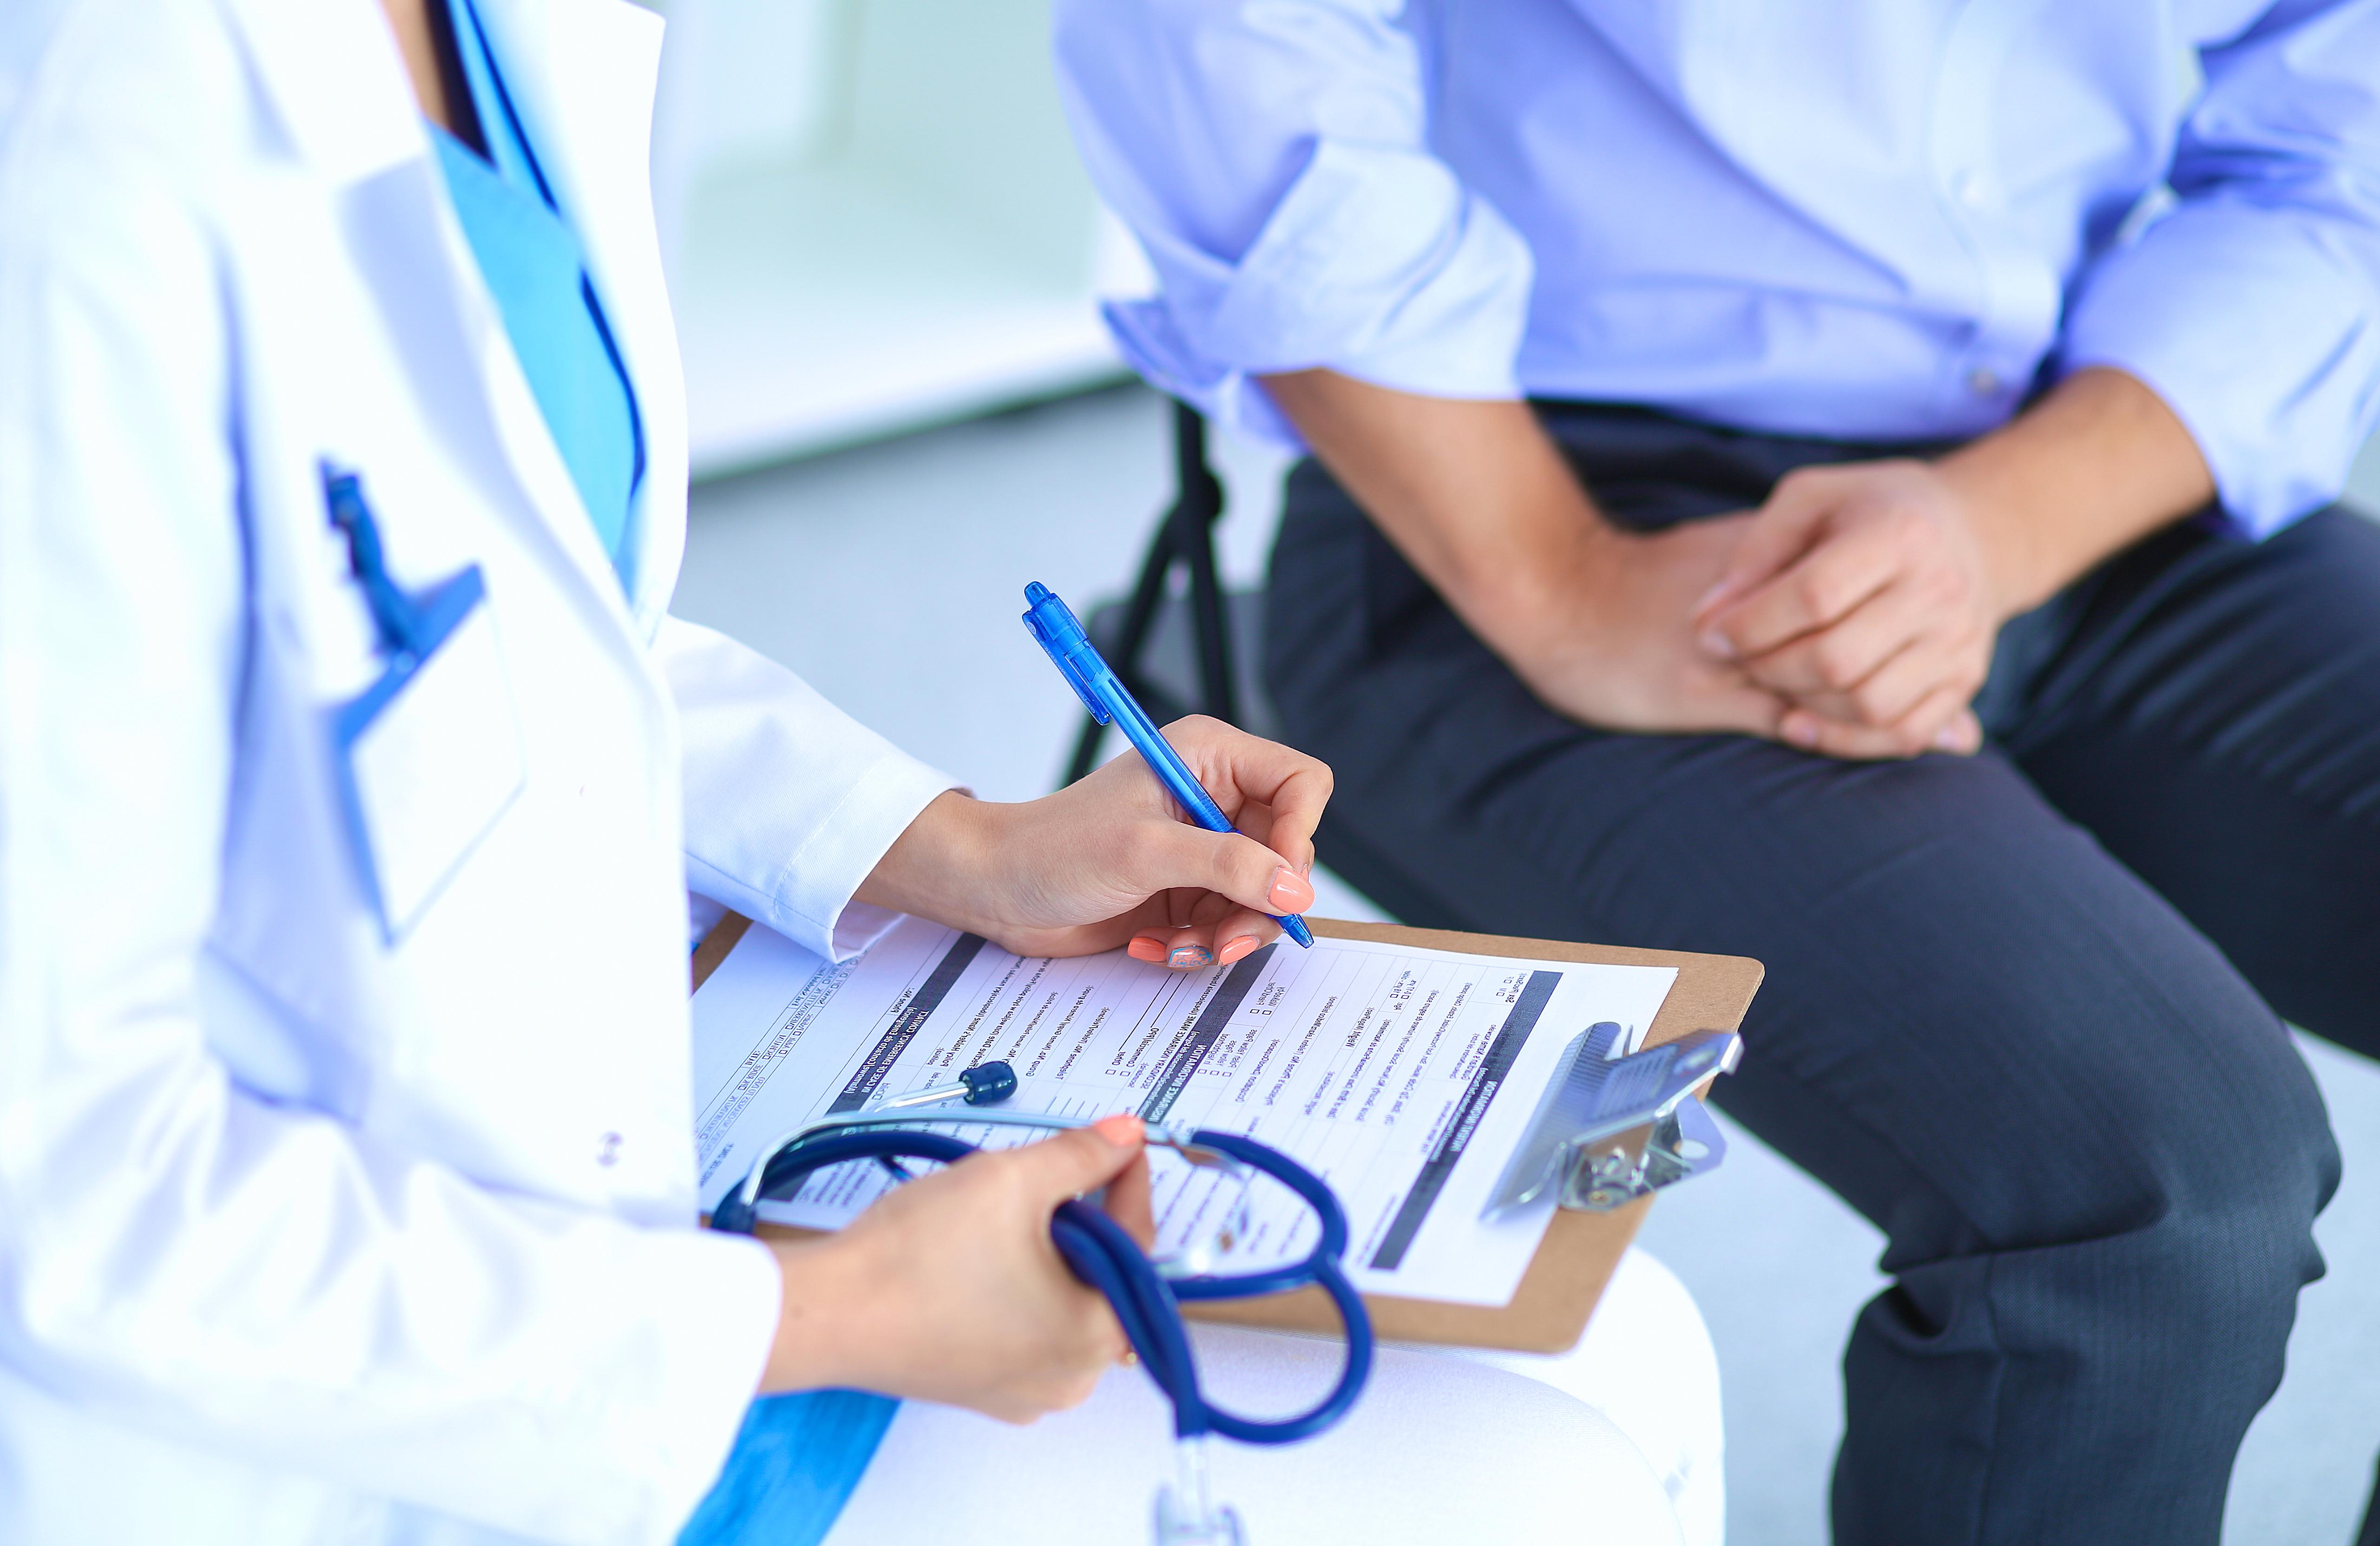 Exames pré-operatórios para cirurgia de refluxo gastroesofágico